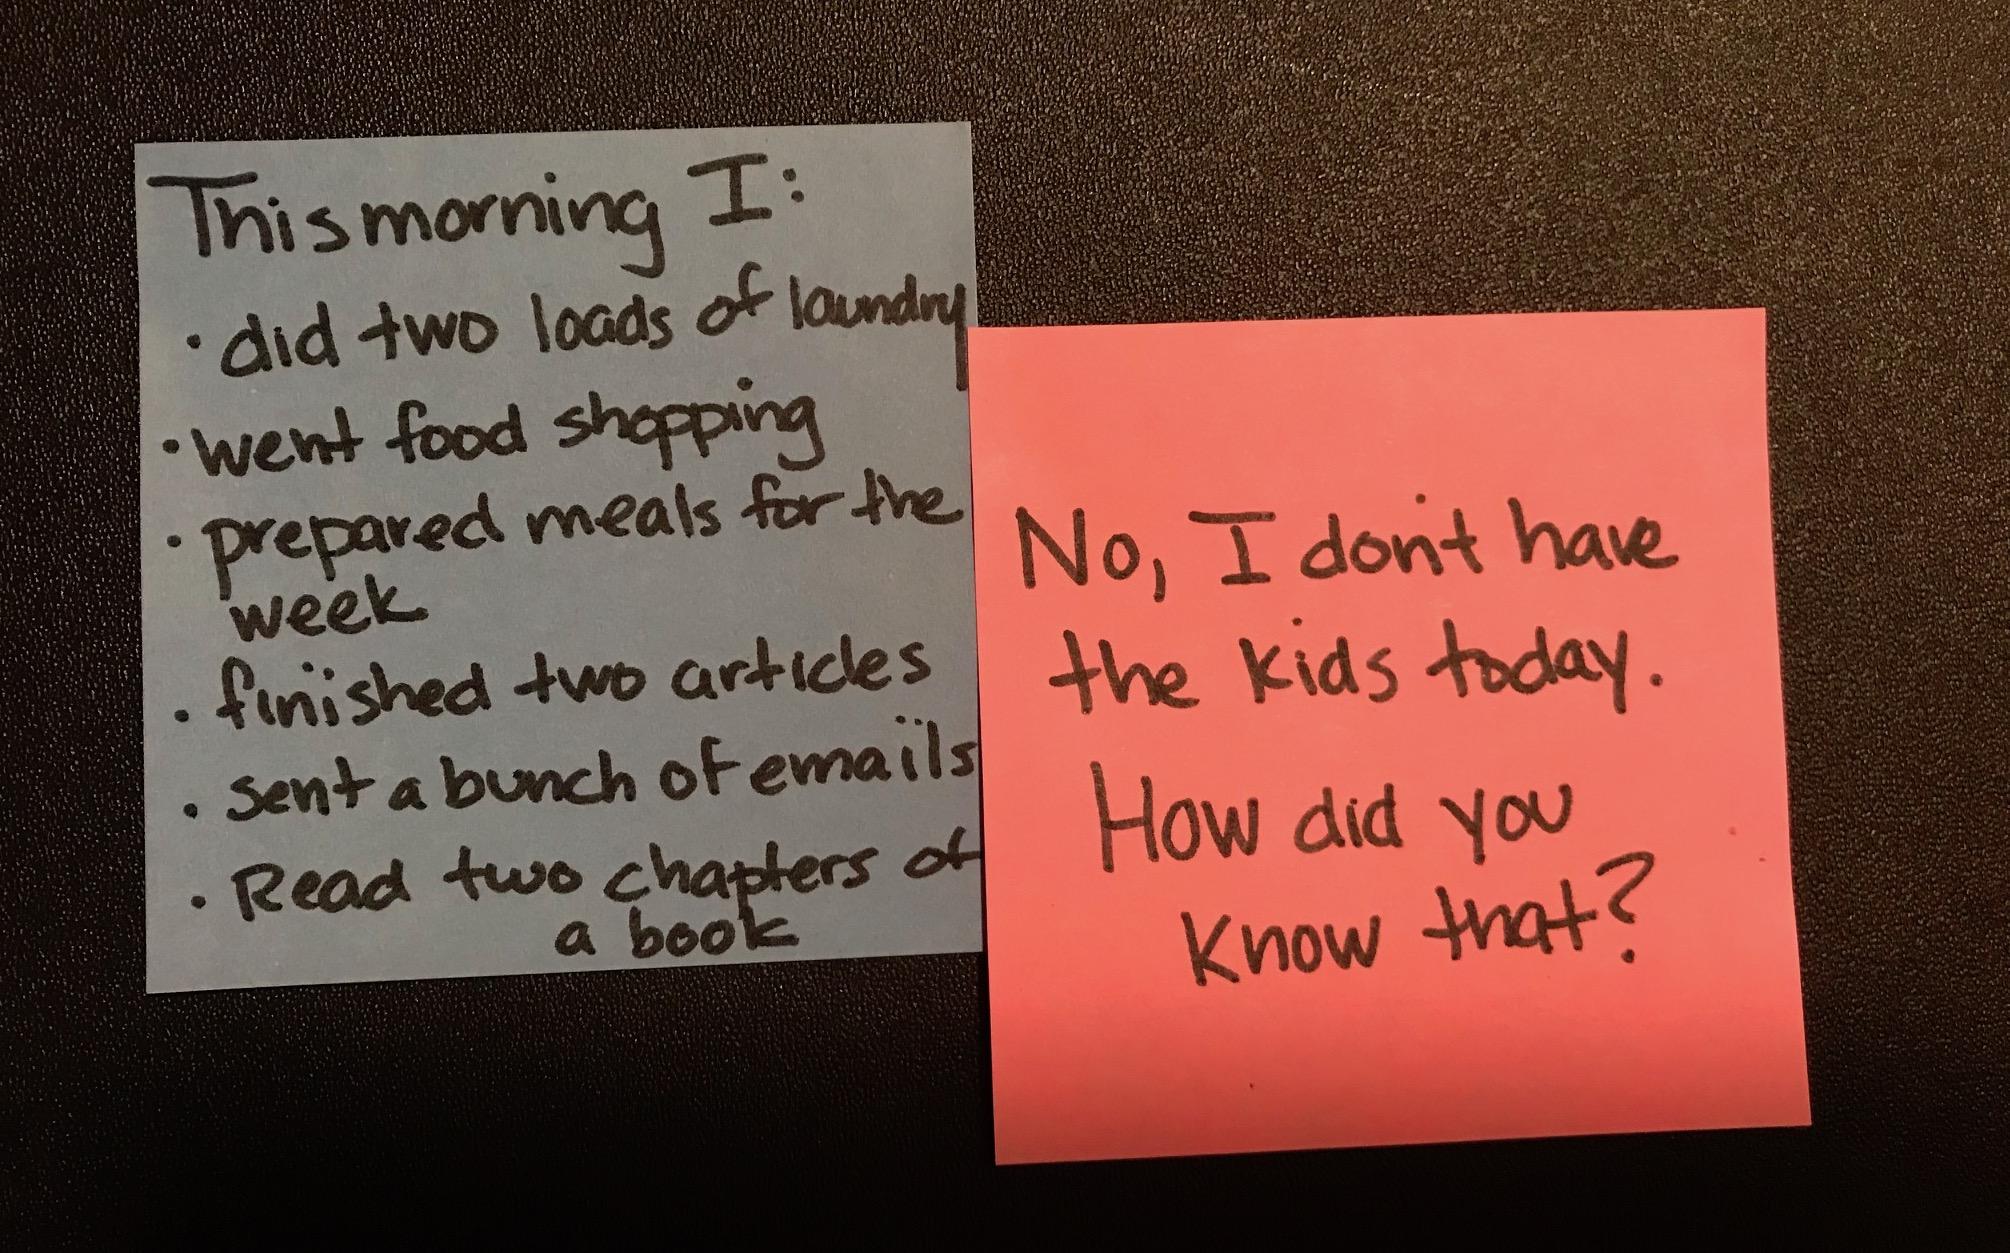 parenting-tip-389